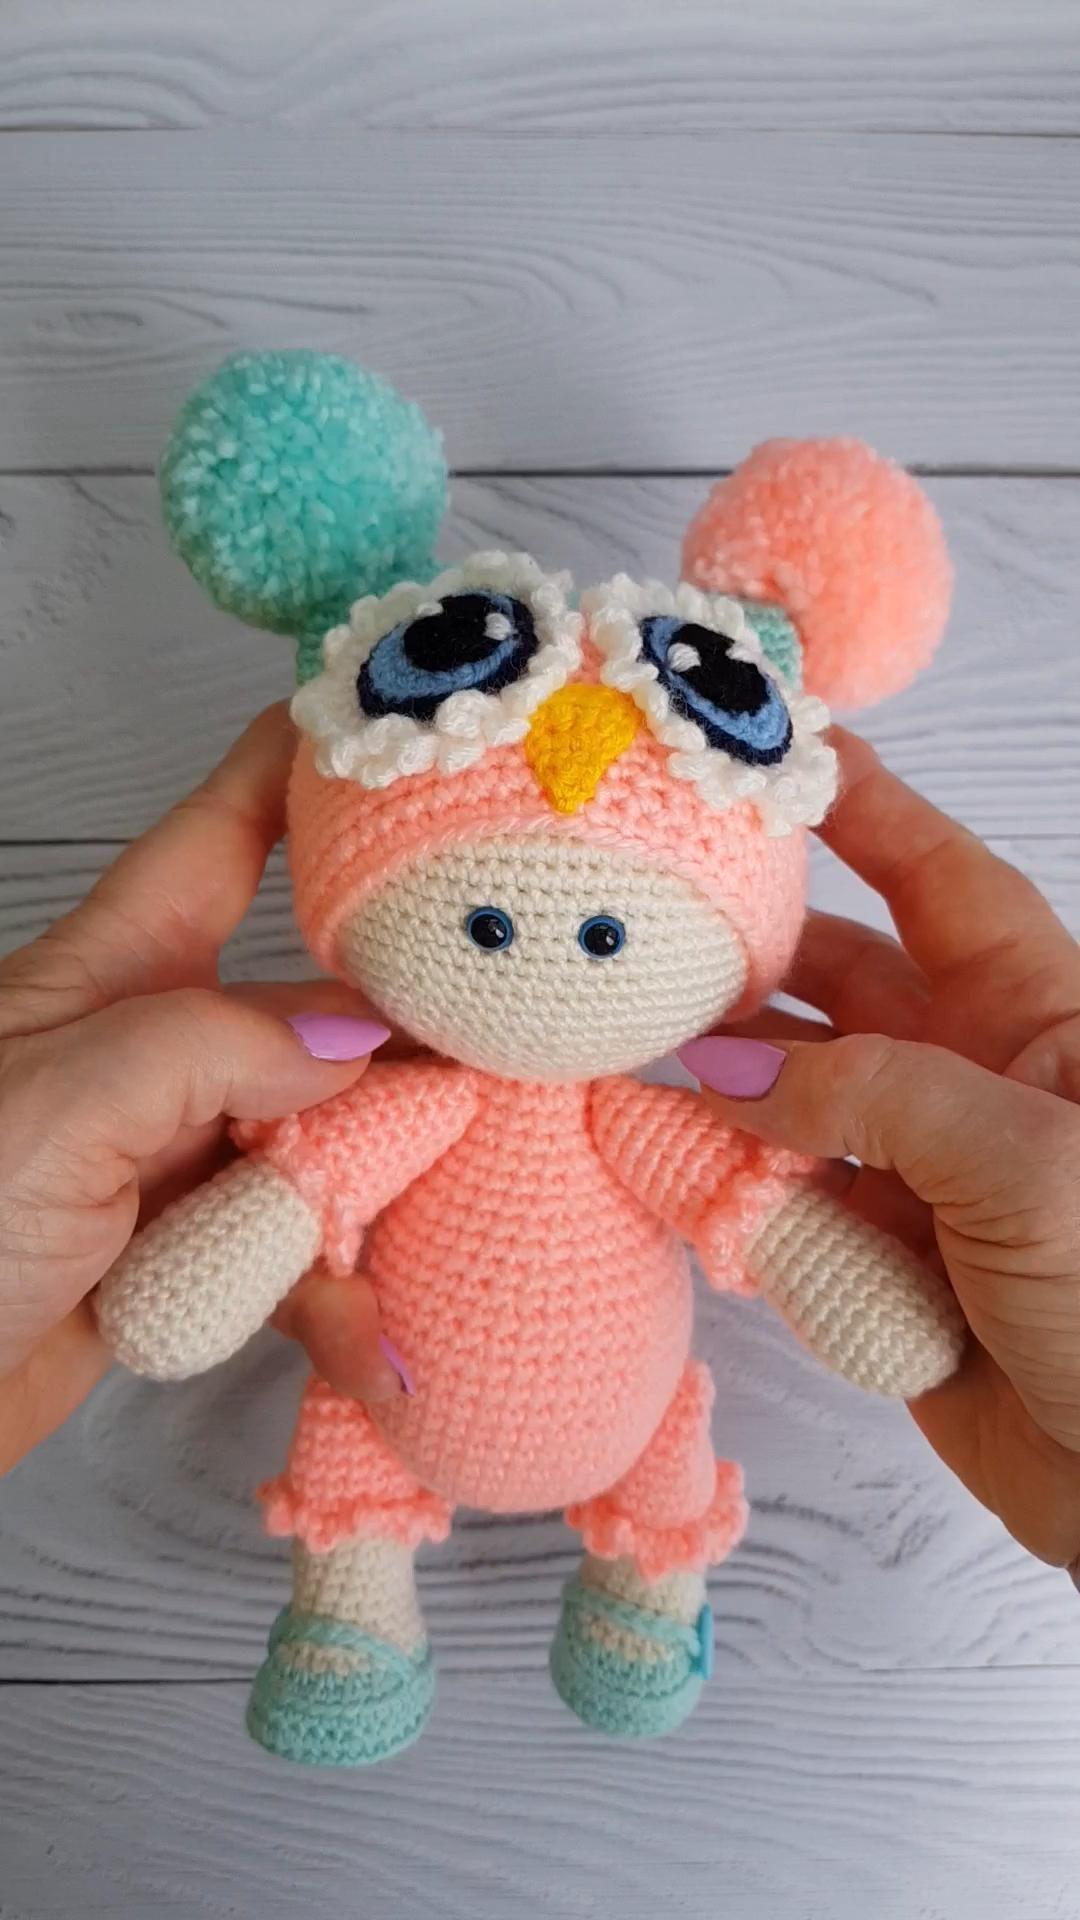 Amigurumi doll videos, knitting patterns free toys baby owls, crochet patterns free toys baby owls